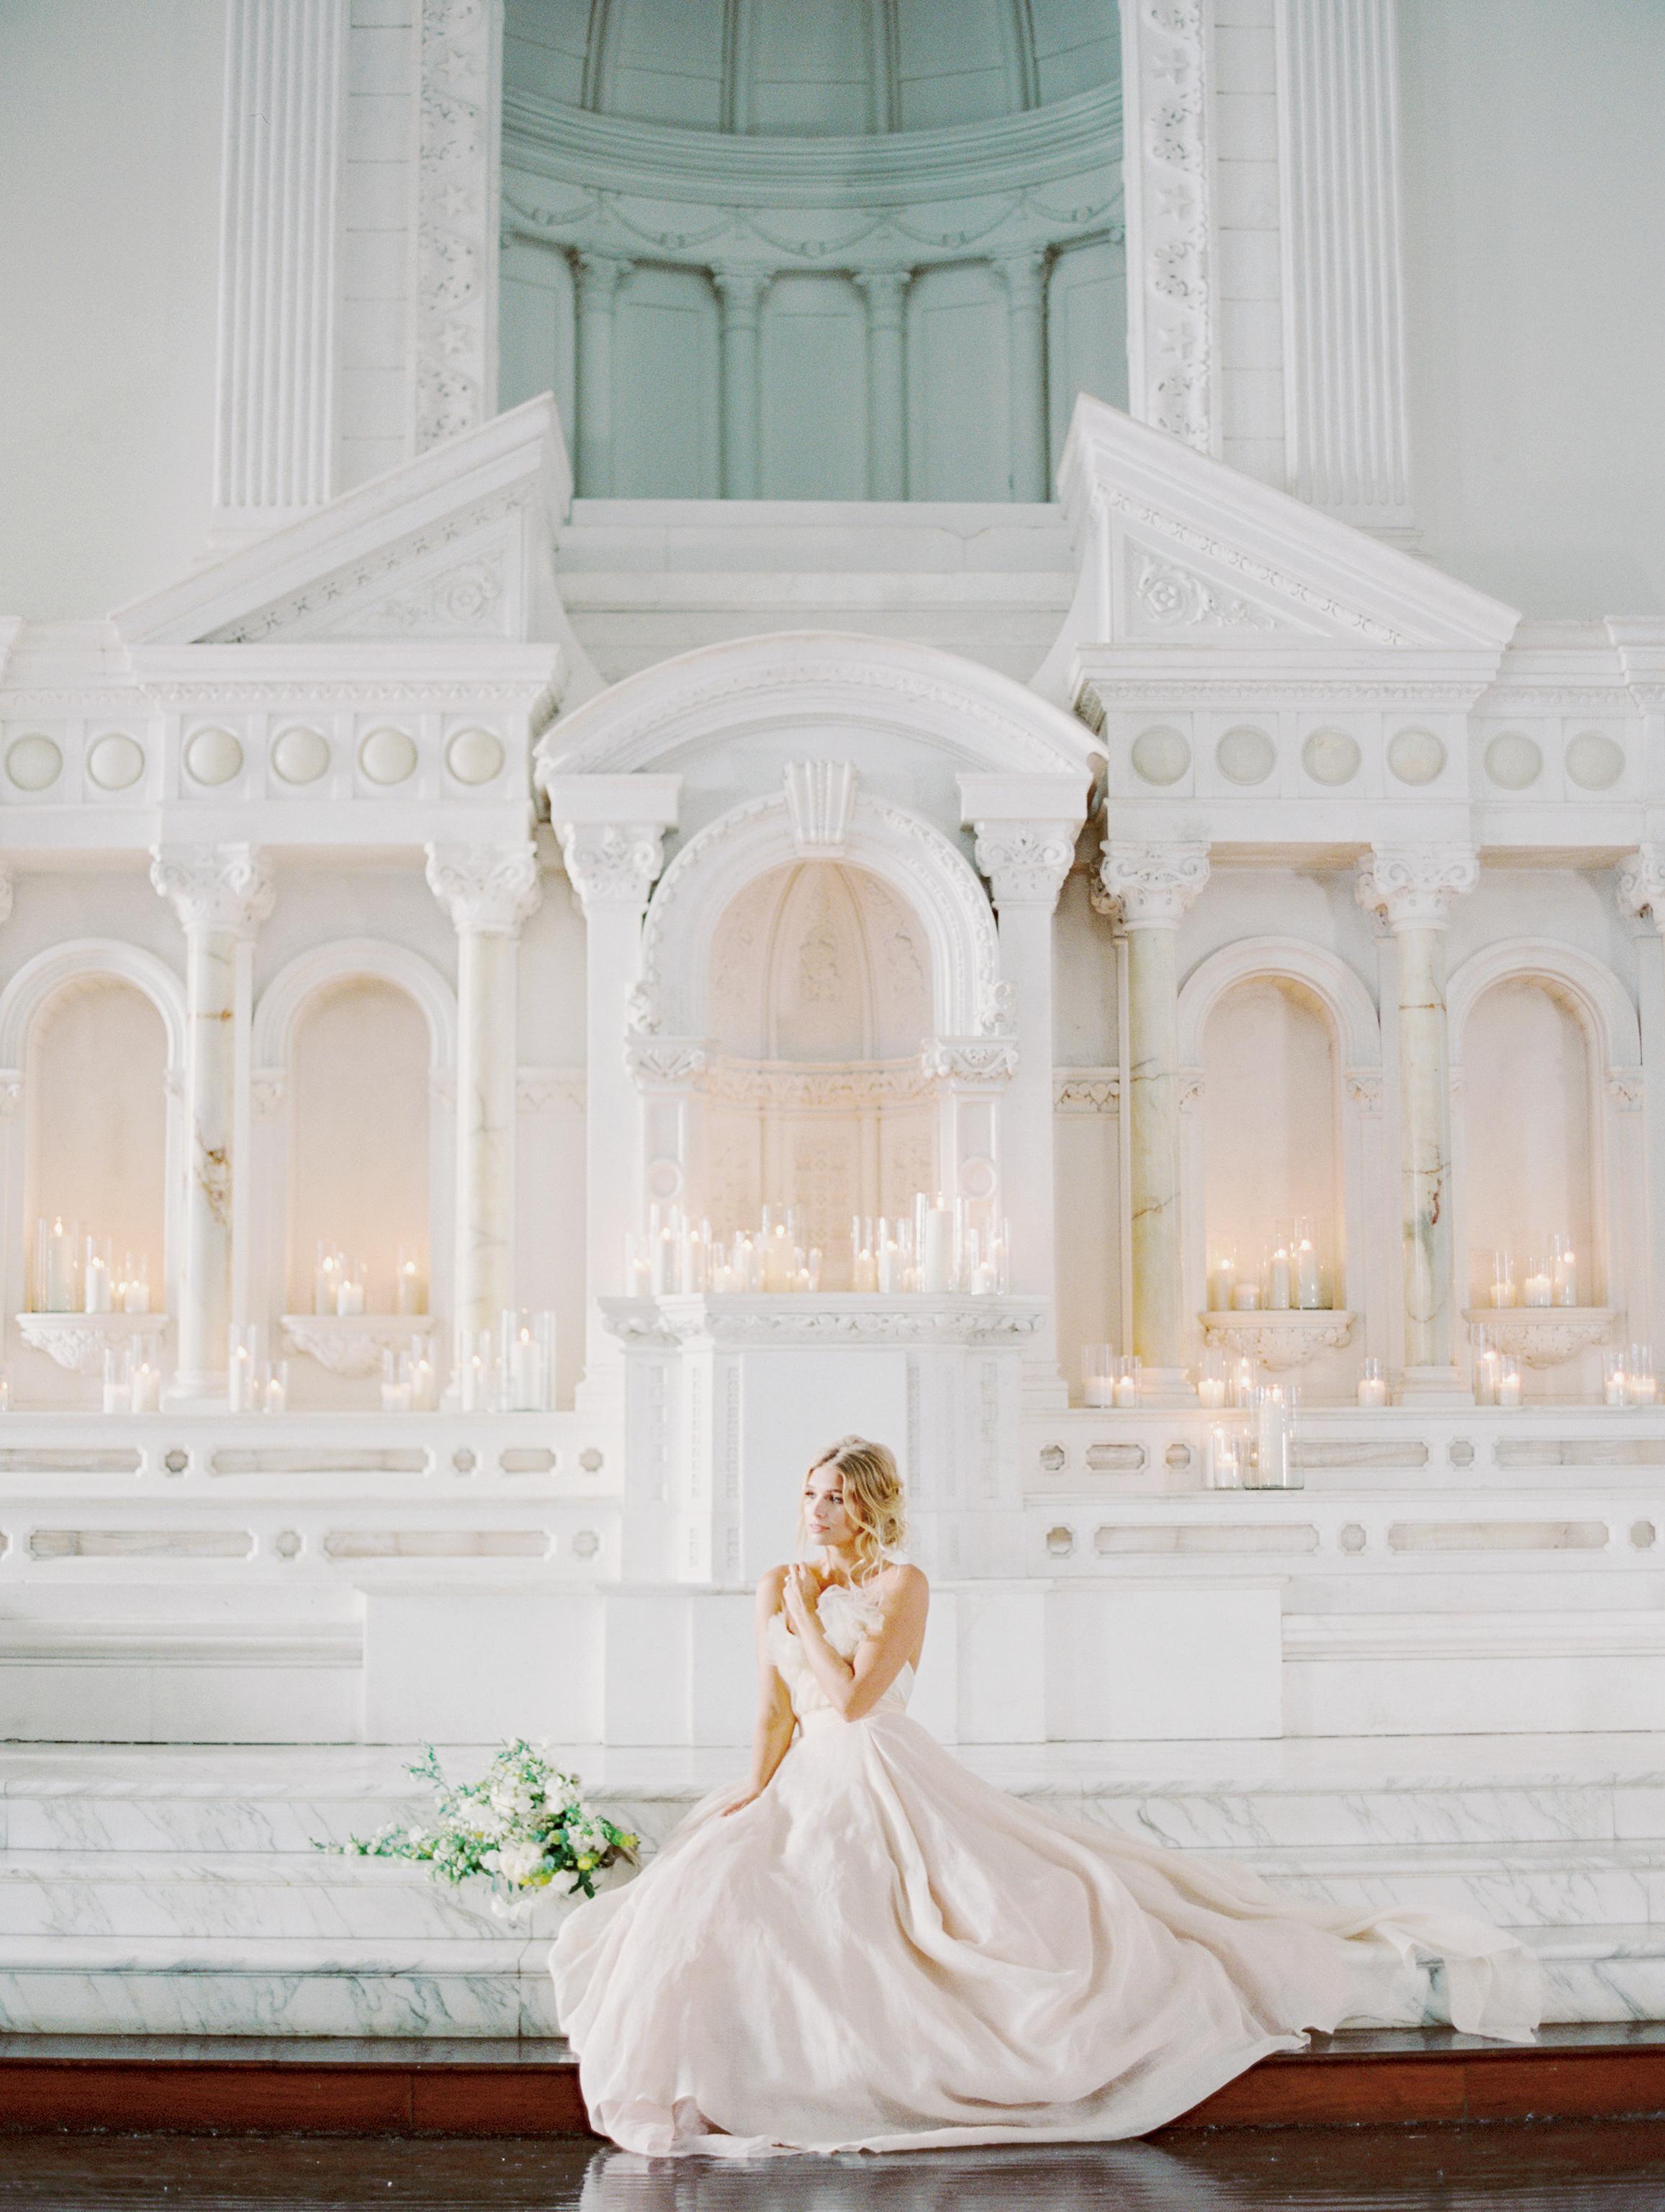 Carol Hannah Bridal Grand Palais Gown VibianabyValentinaGlidden_146.jpg